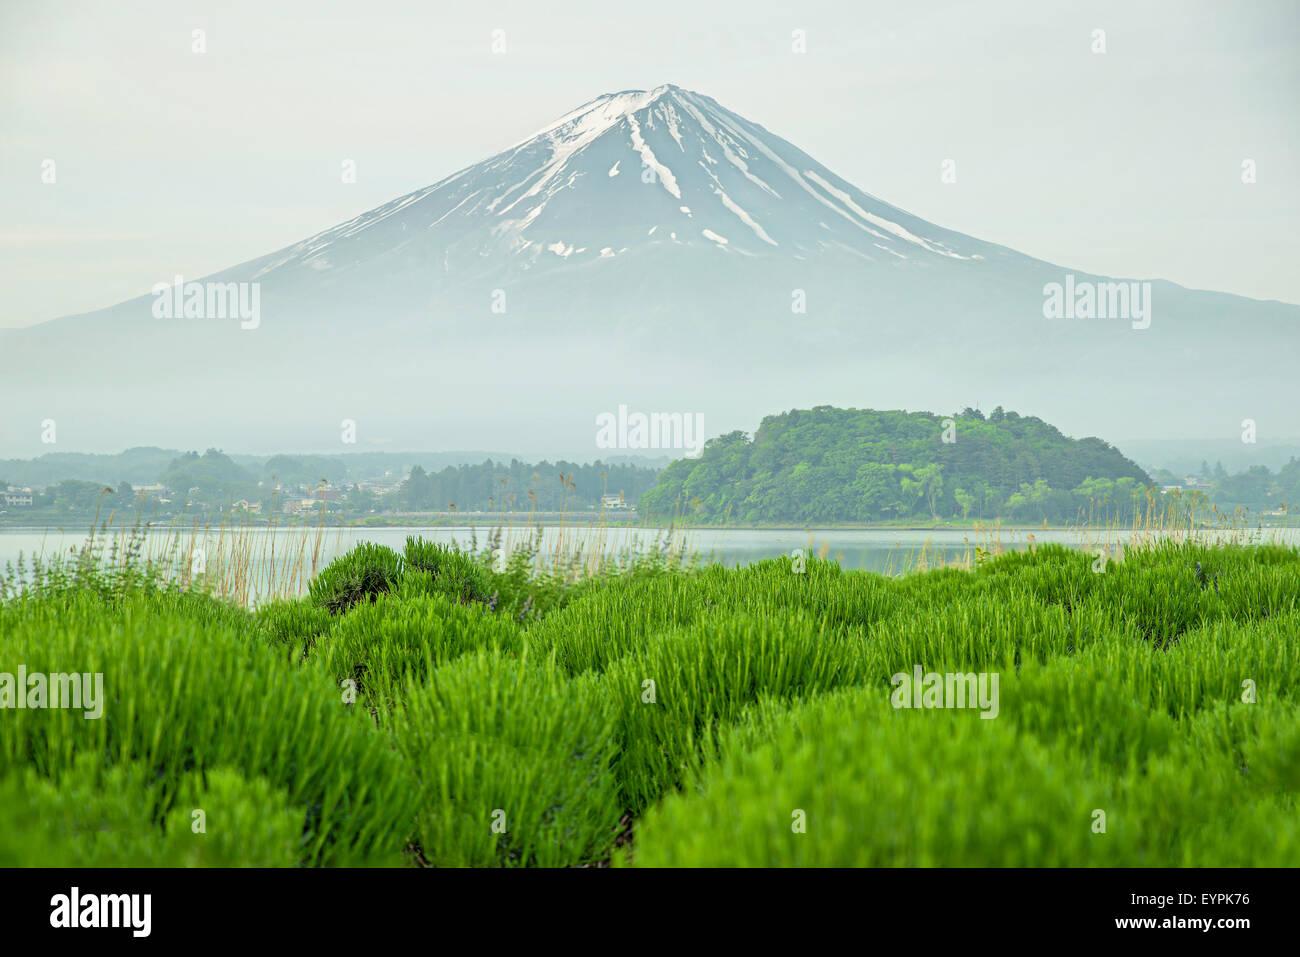 Mt fuji in mattinata a kawaguchi, Giappone Immagini Stock